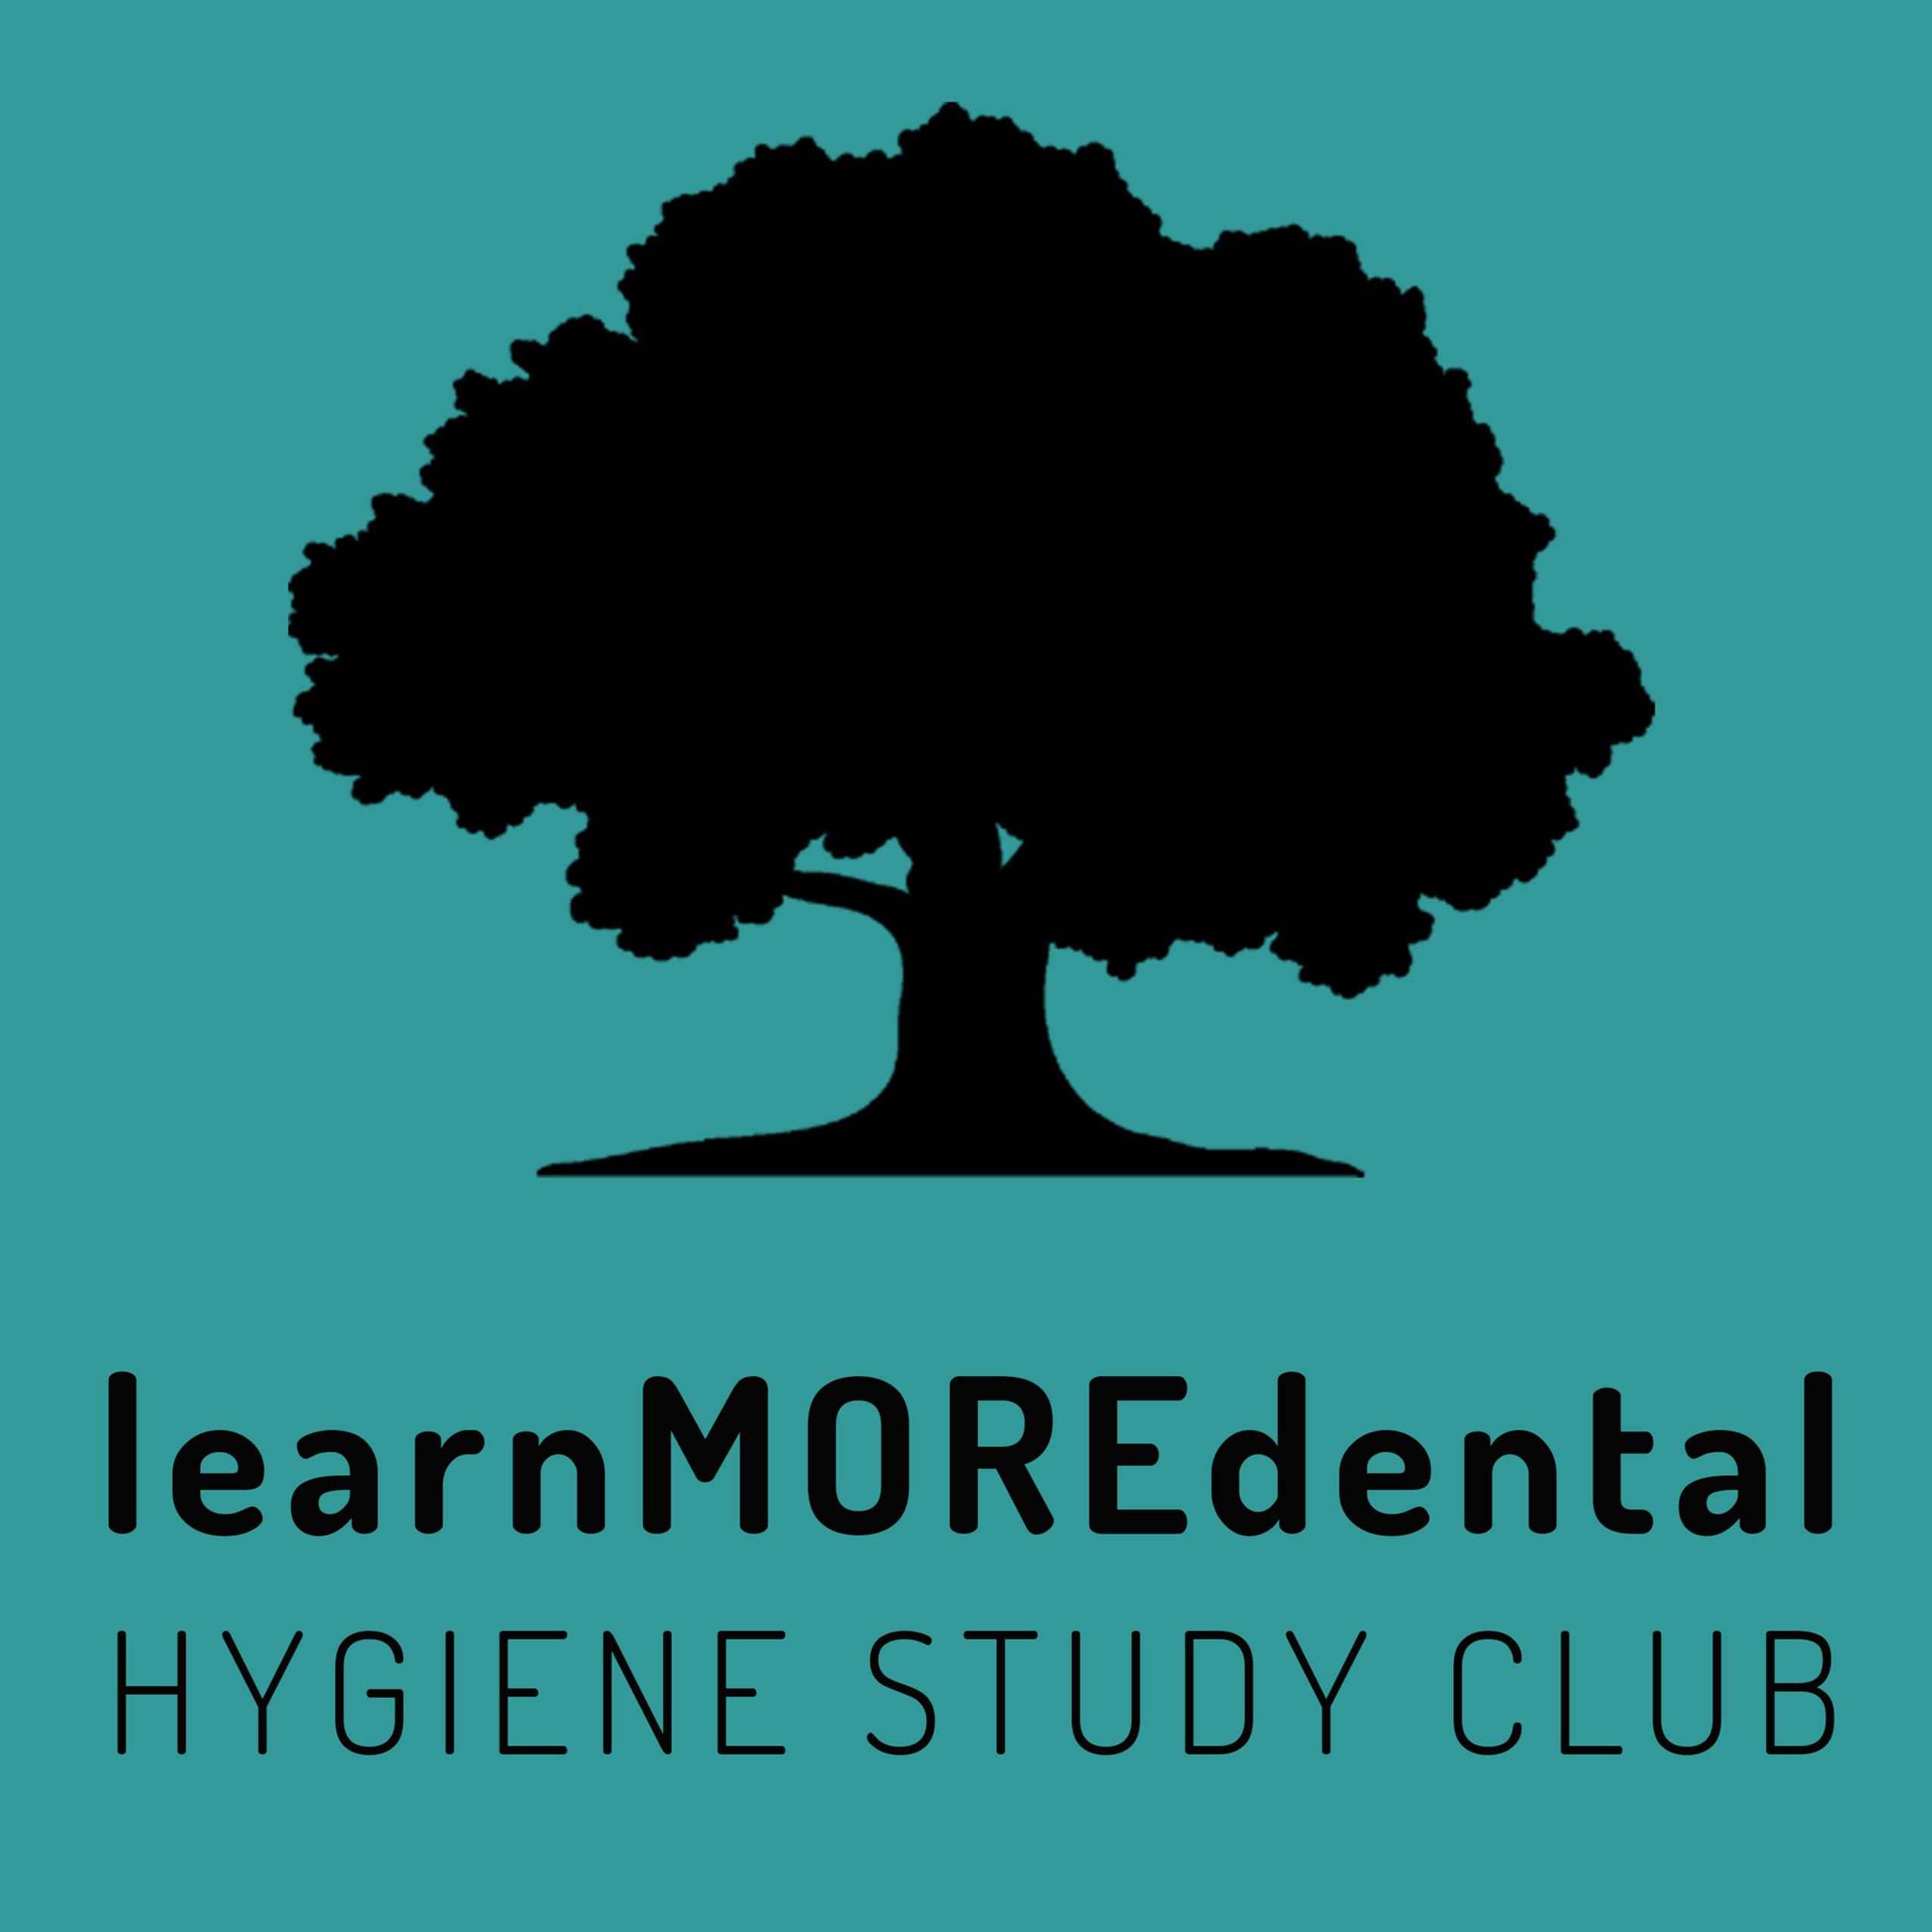 2021 Hygiene Study Club Membership